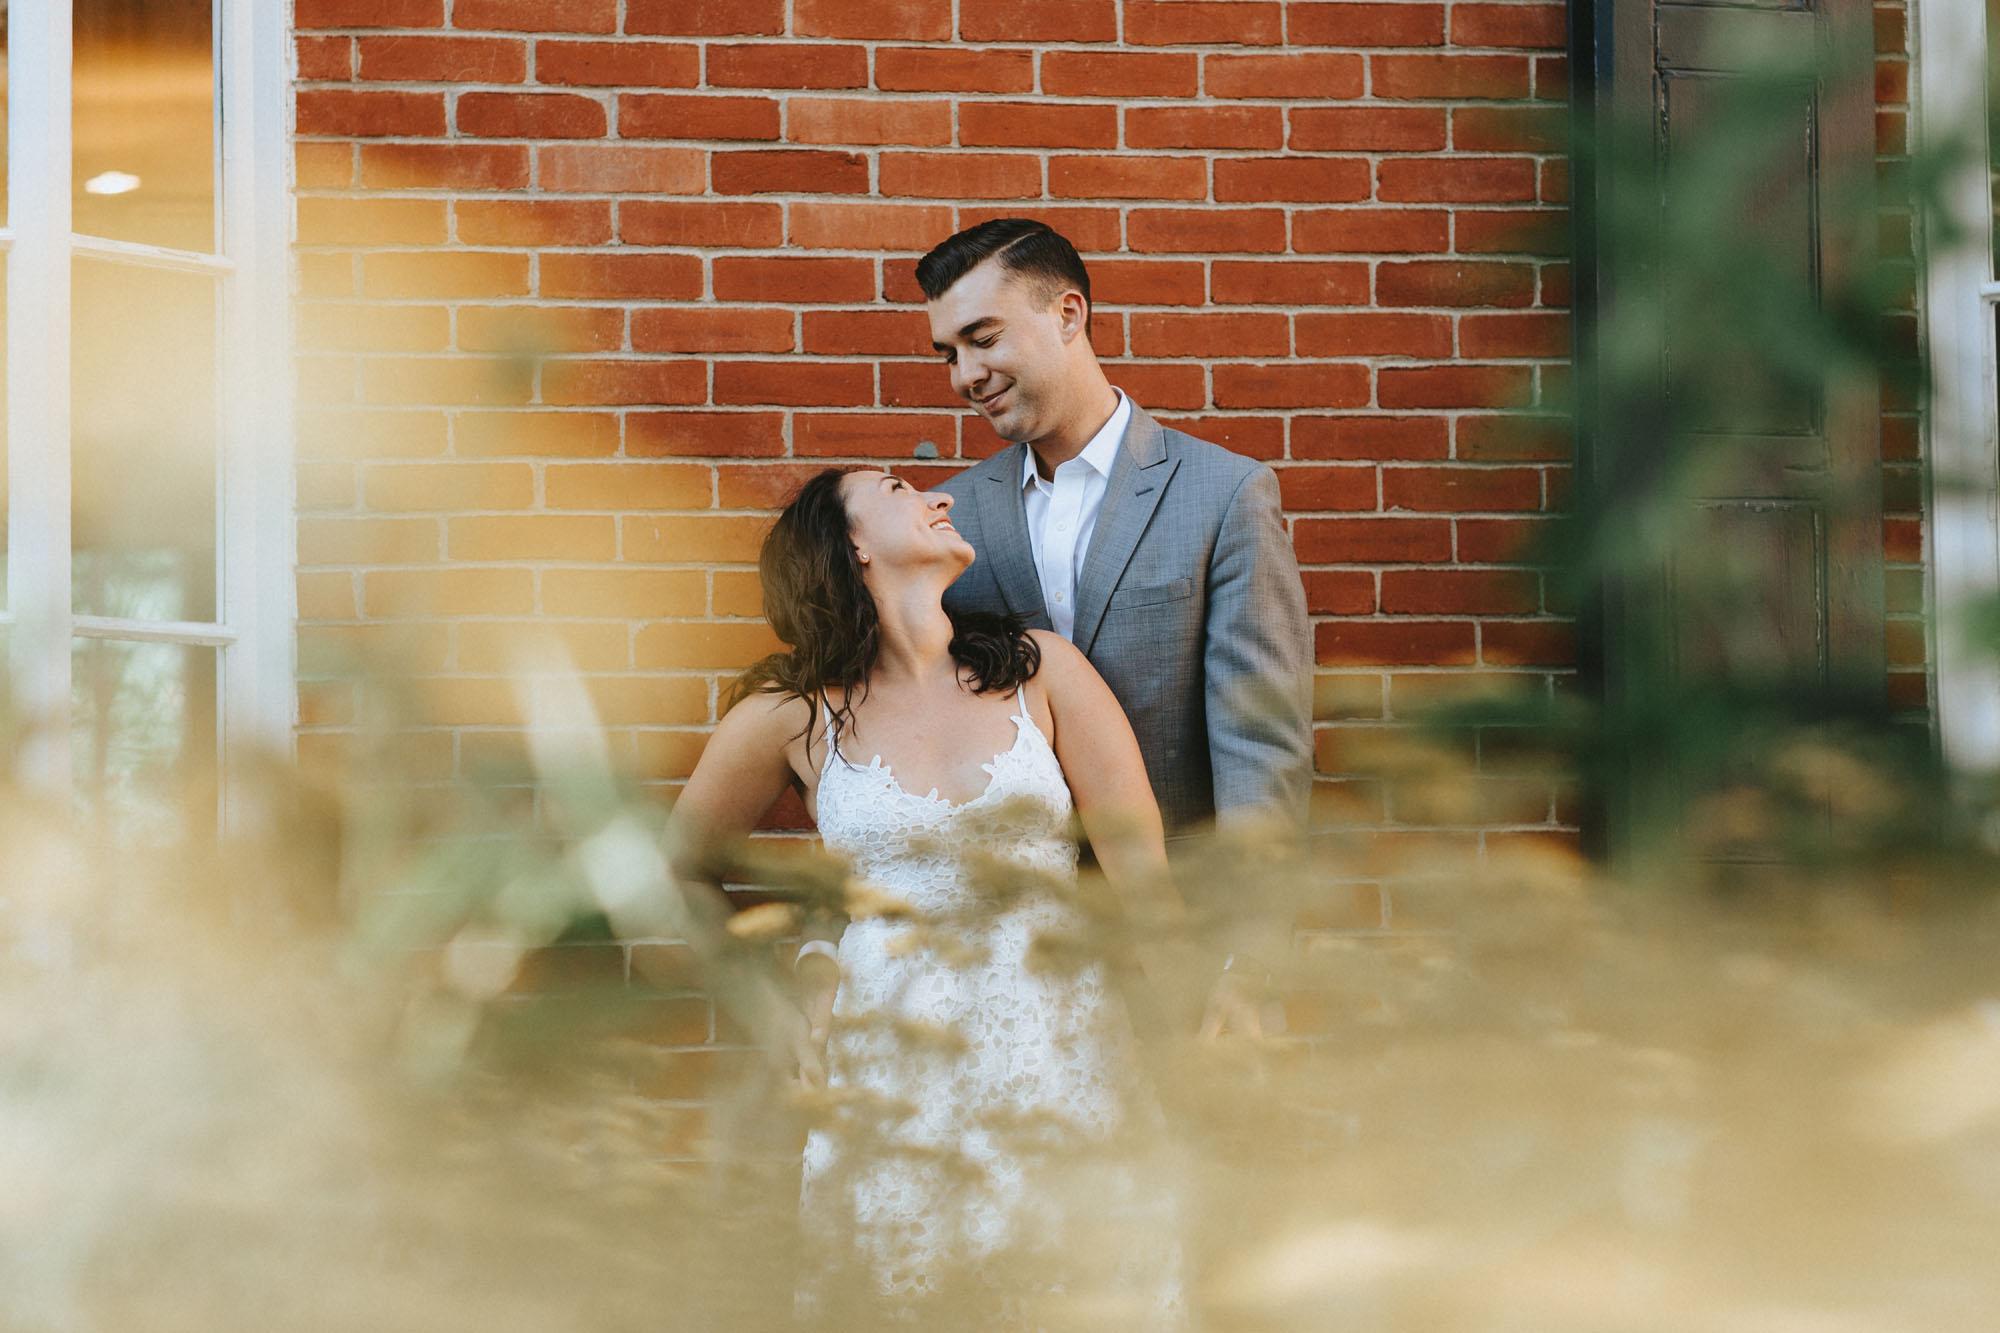 Twisted-Oaks-Studio-Shannon-Billy-Engagement-8.jpg